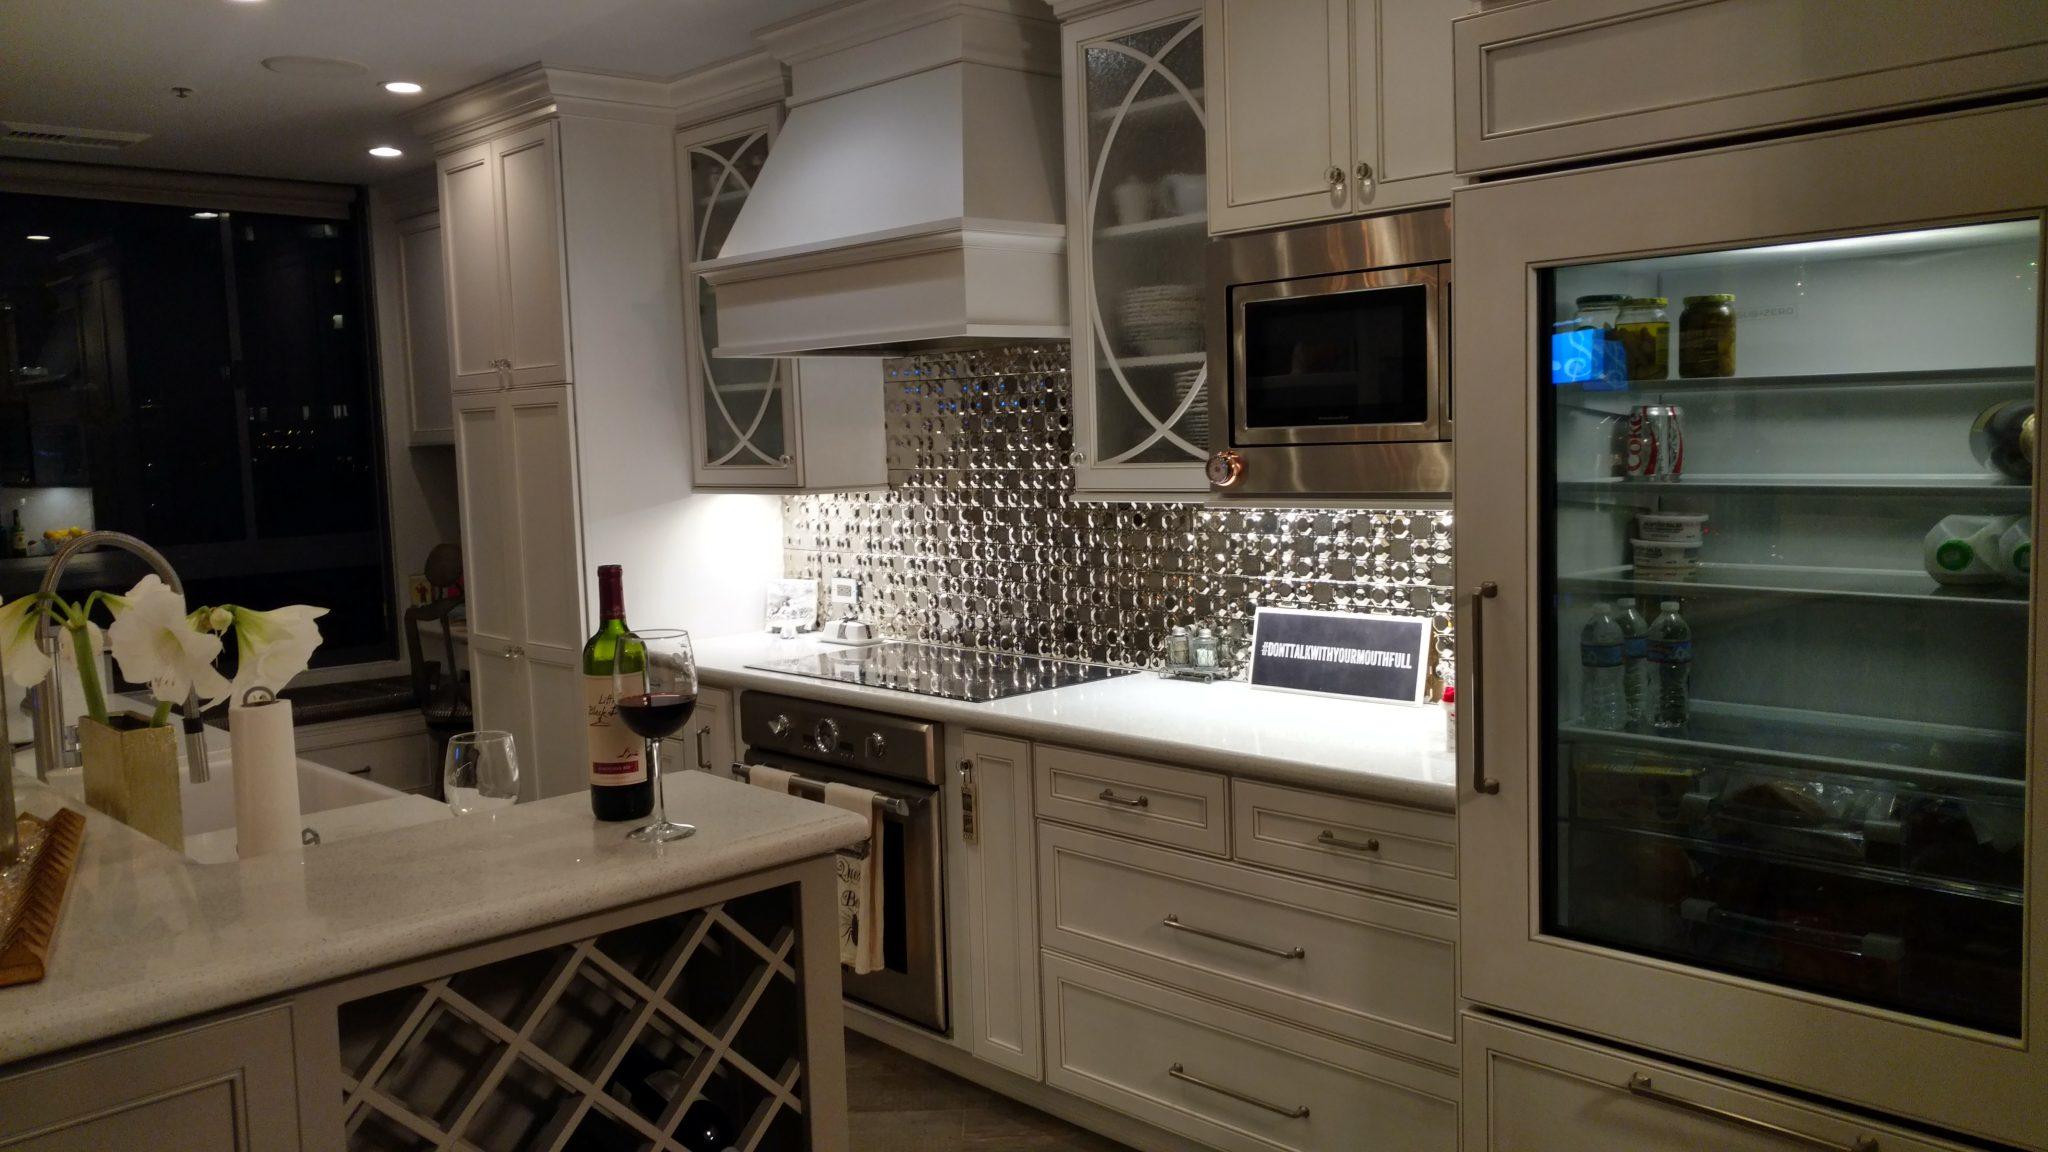 San Diego Interior Designer and Color Consultant | Anna Rodé Designs | Modern High-Rise Condo Kitchen